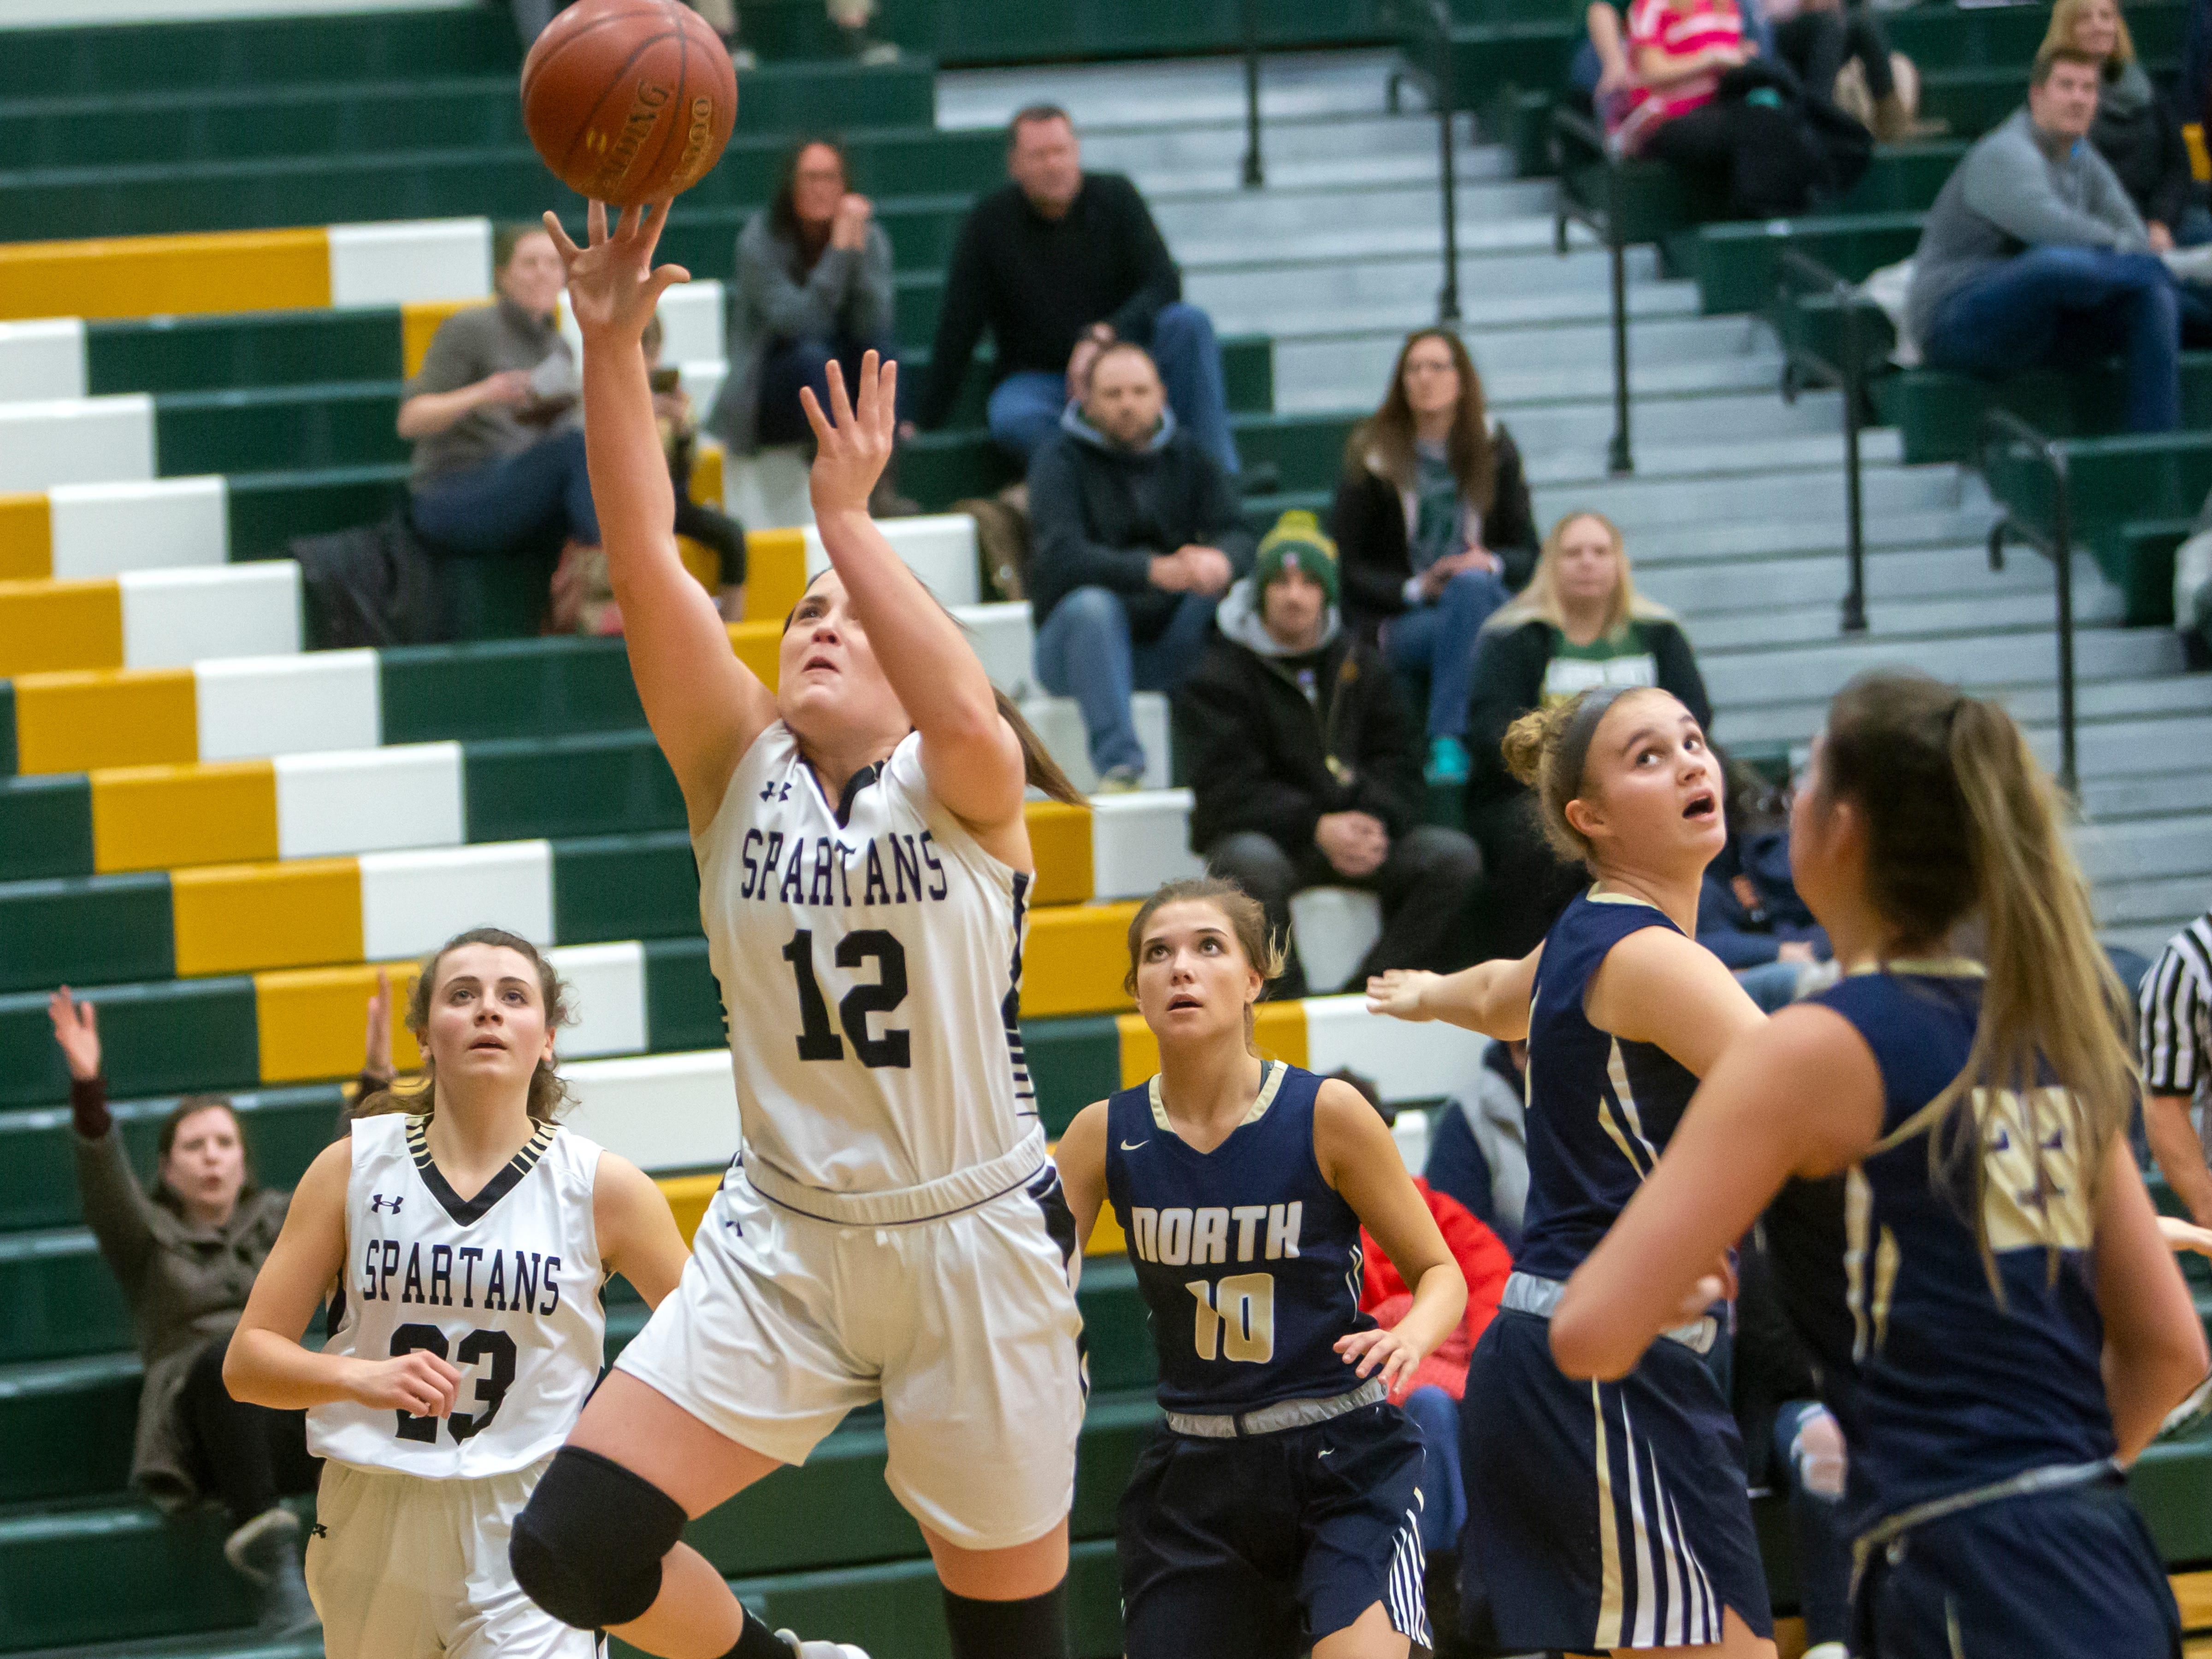 Oshkosh North's Brie Gauthier goes up for a shot at a girls basketball game against Appleton North Friday, February 8, 2019, in Oshkosh, Wis., at Oshkosh North High School.